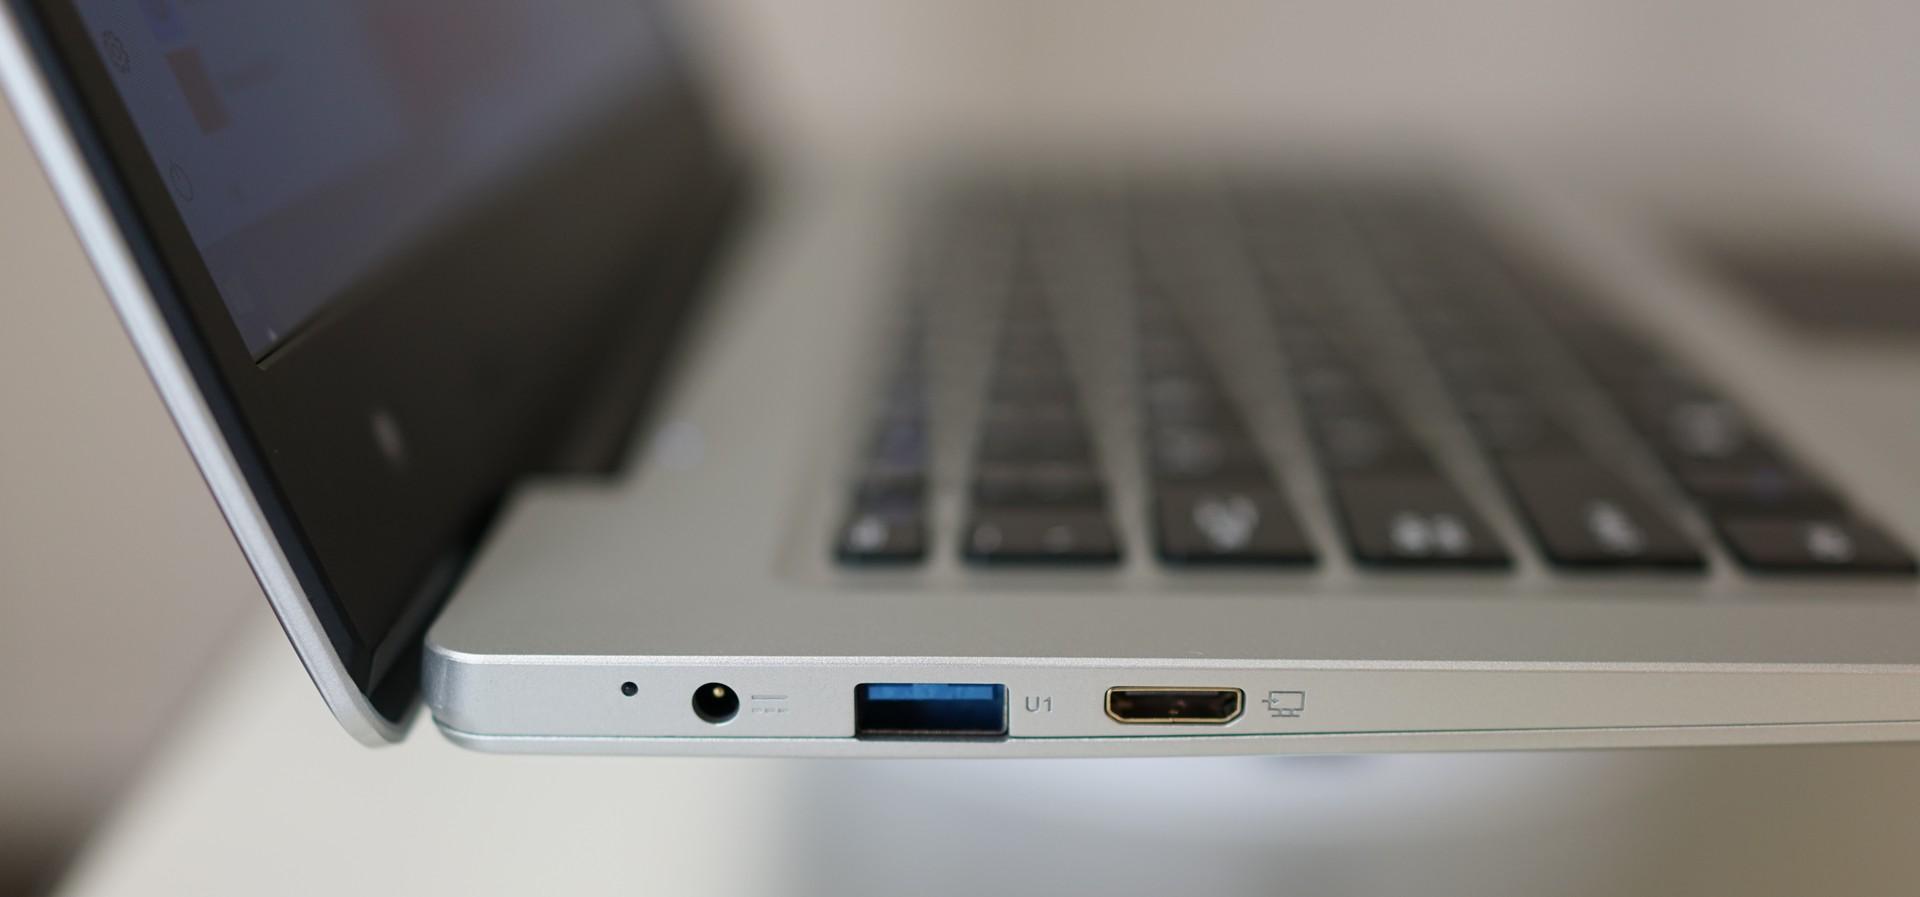 Jumper EZbook 3S 実機レビュー インターフェースの参考写真 左側